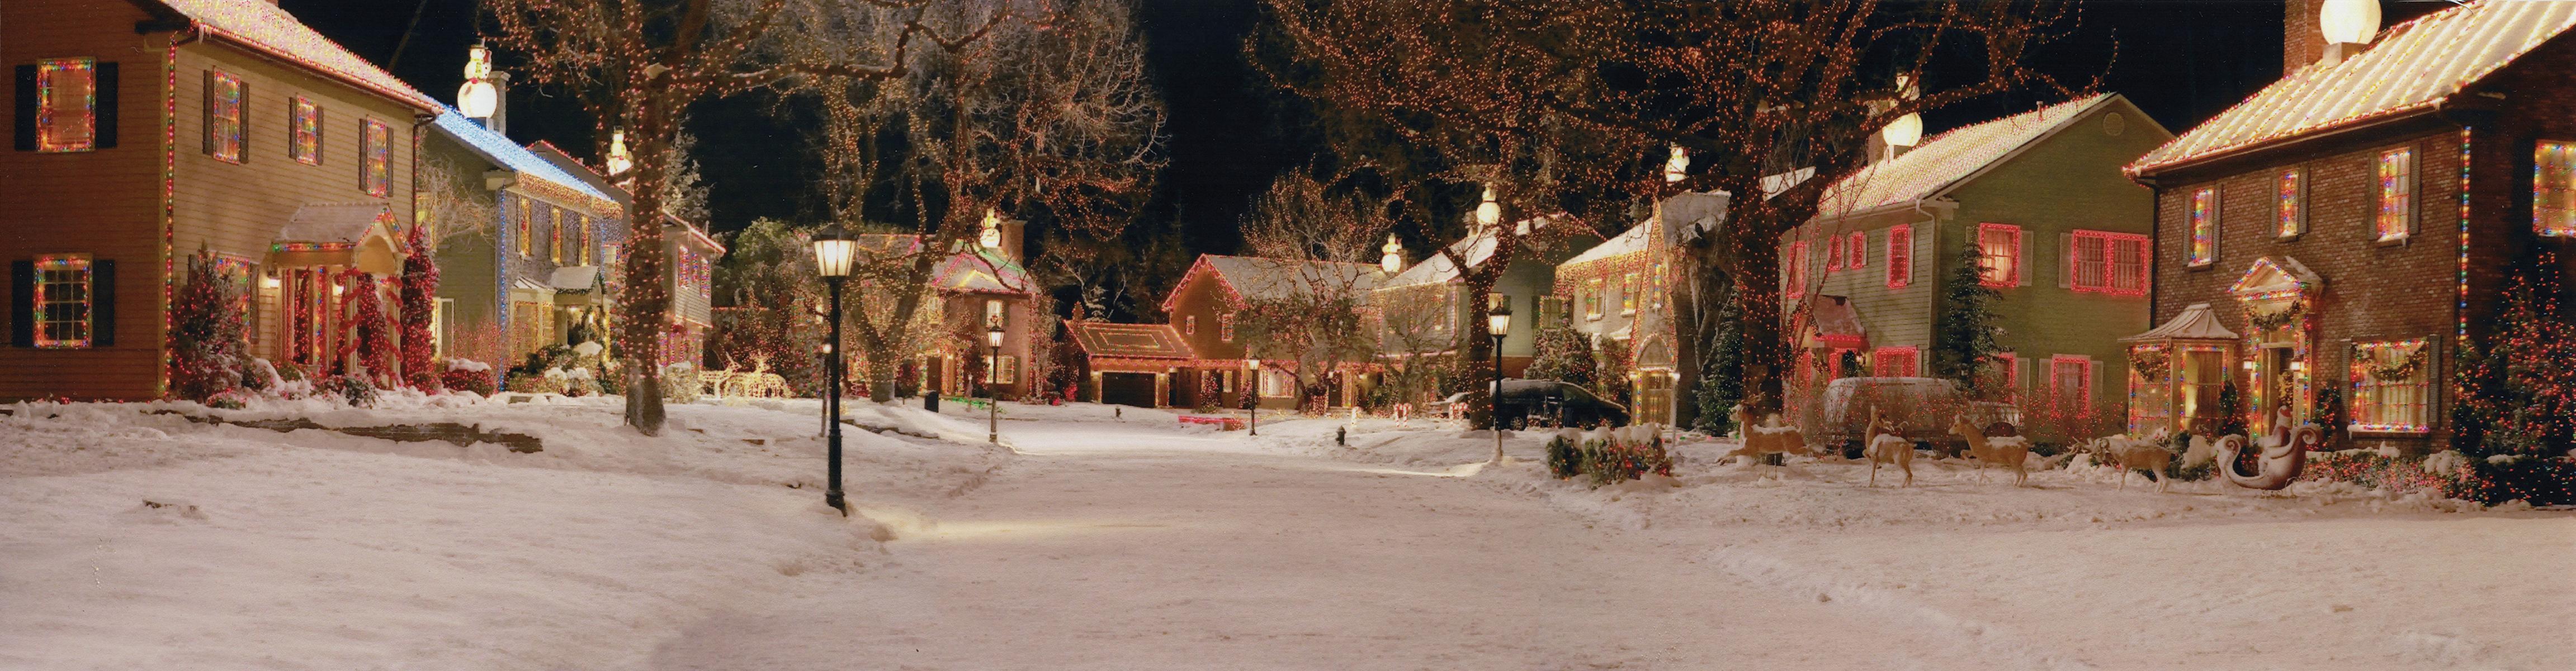 Christmas With The Cranks.Christmas With The Kranks 2004